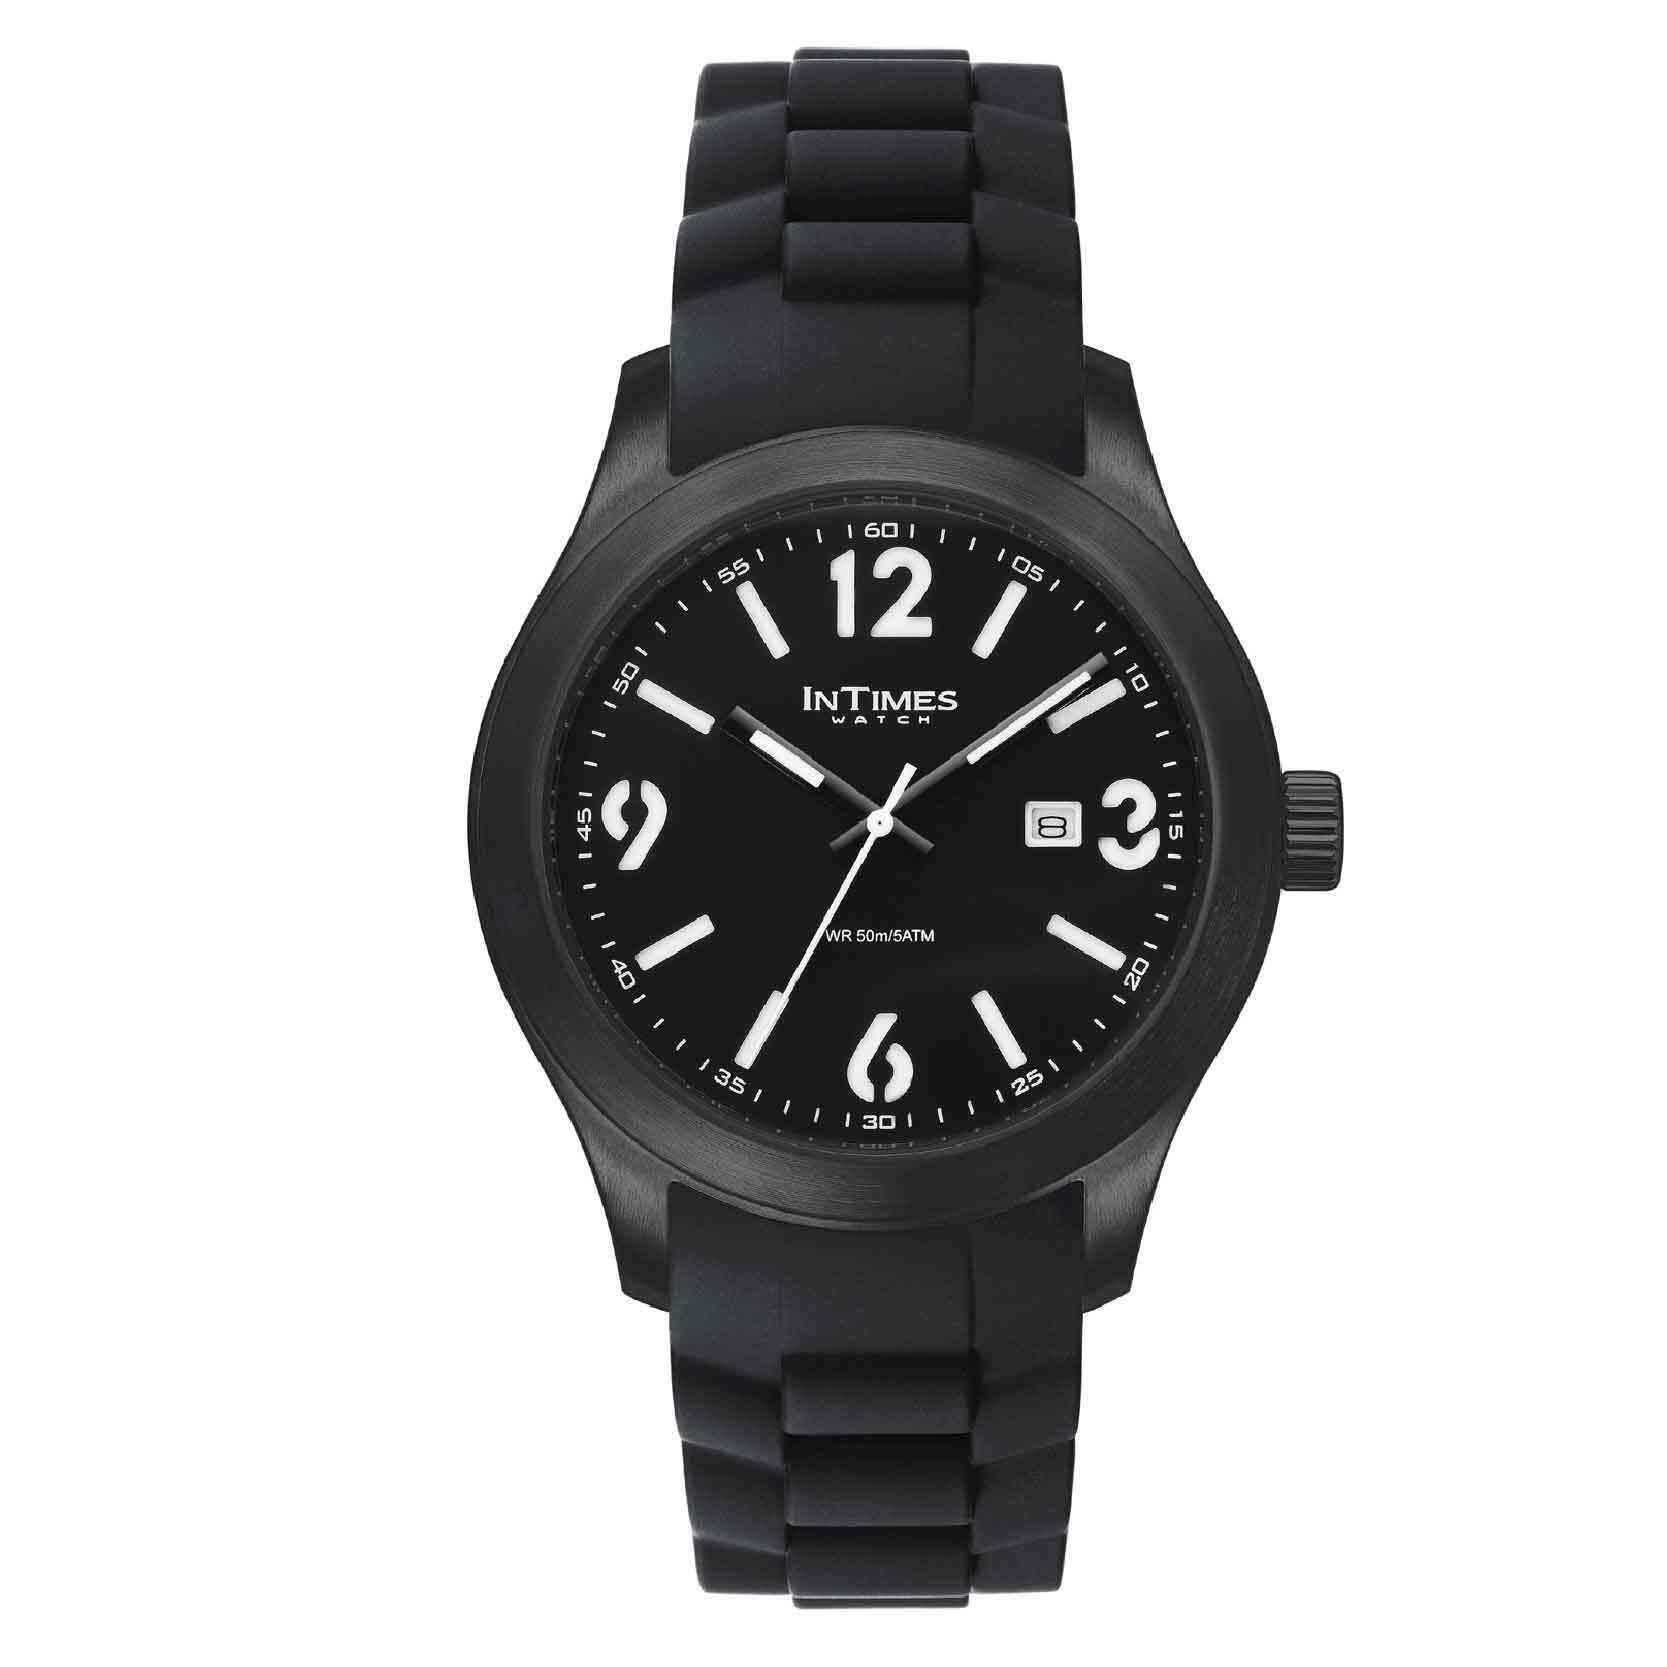 Intimes - Black Watch - White